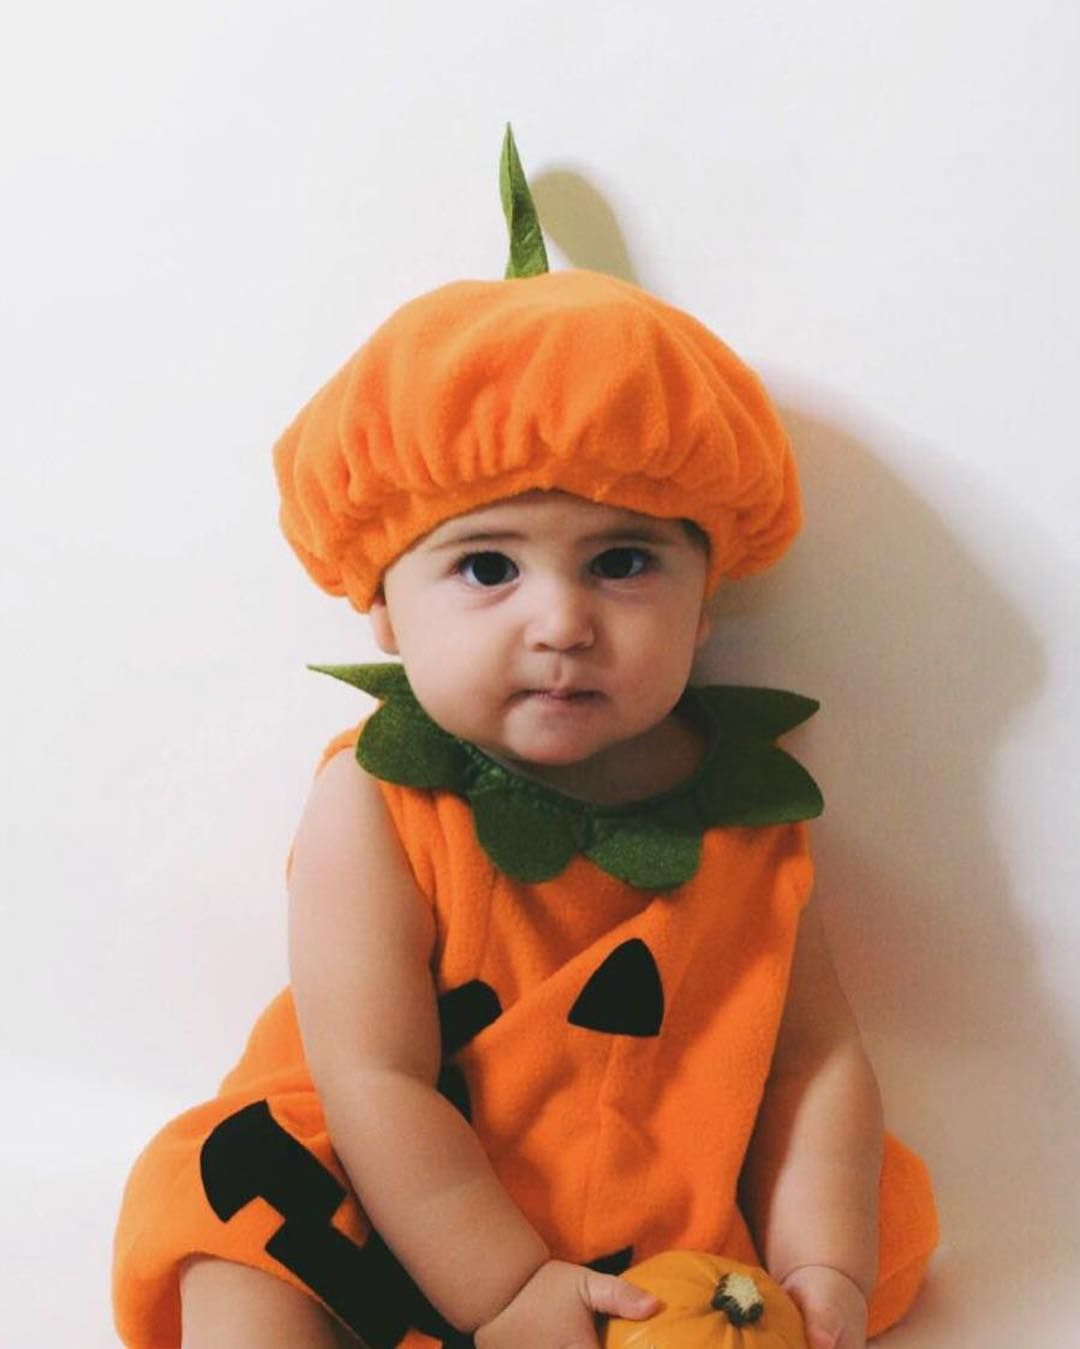 pottery barn, pottery barn kids, halloween costume, pumpkin costume